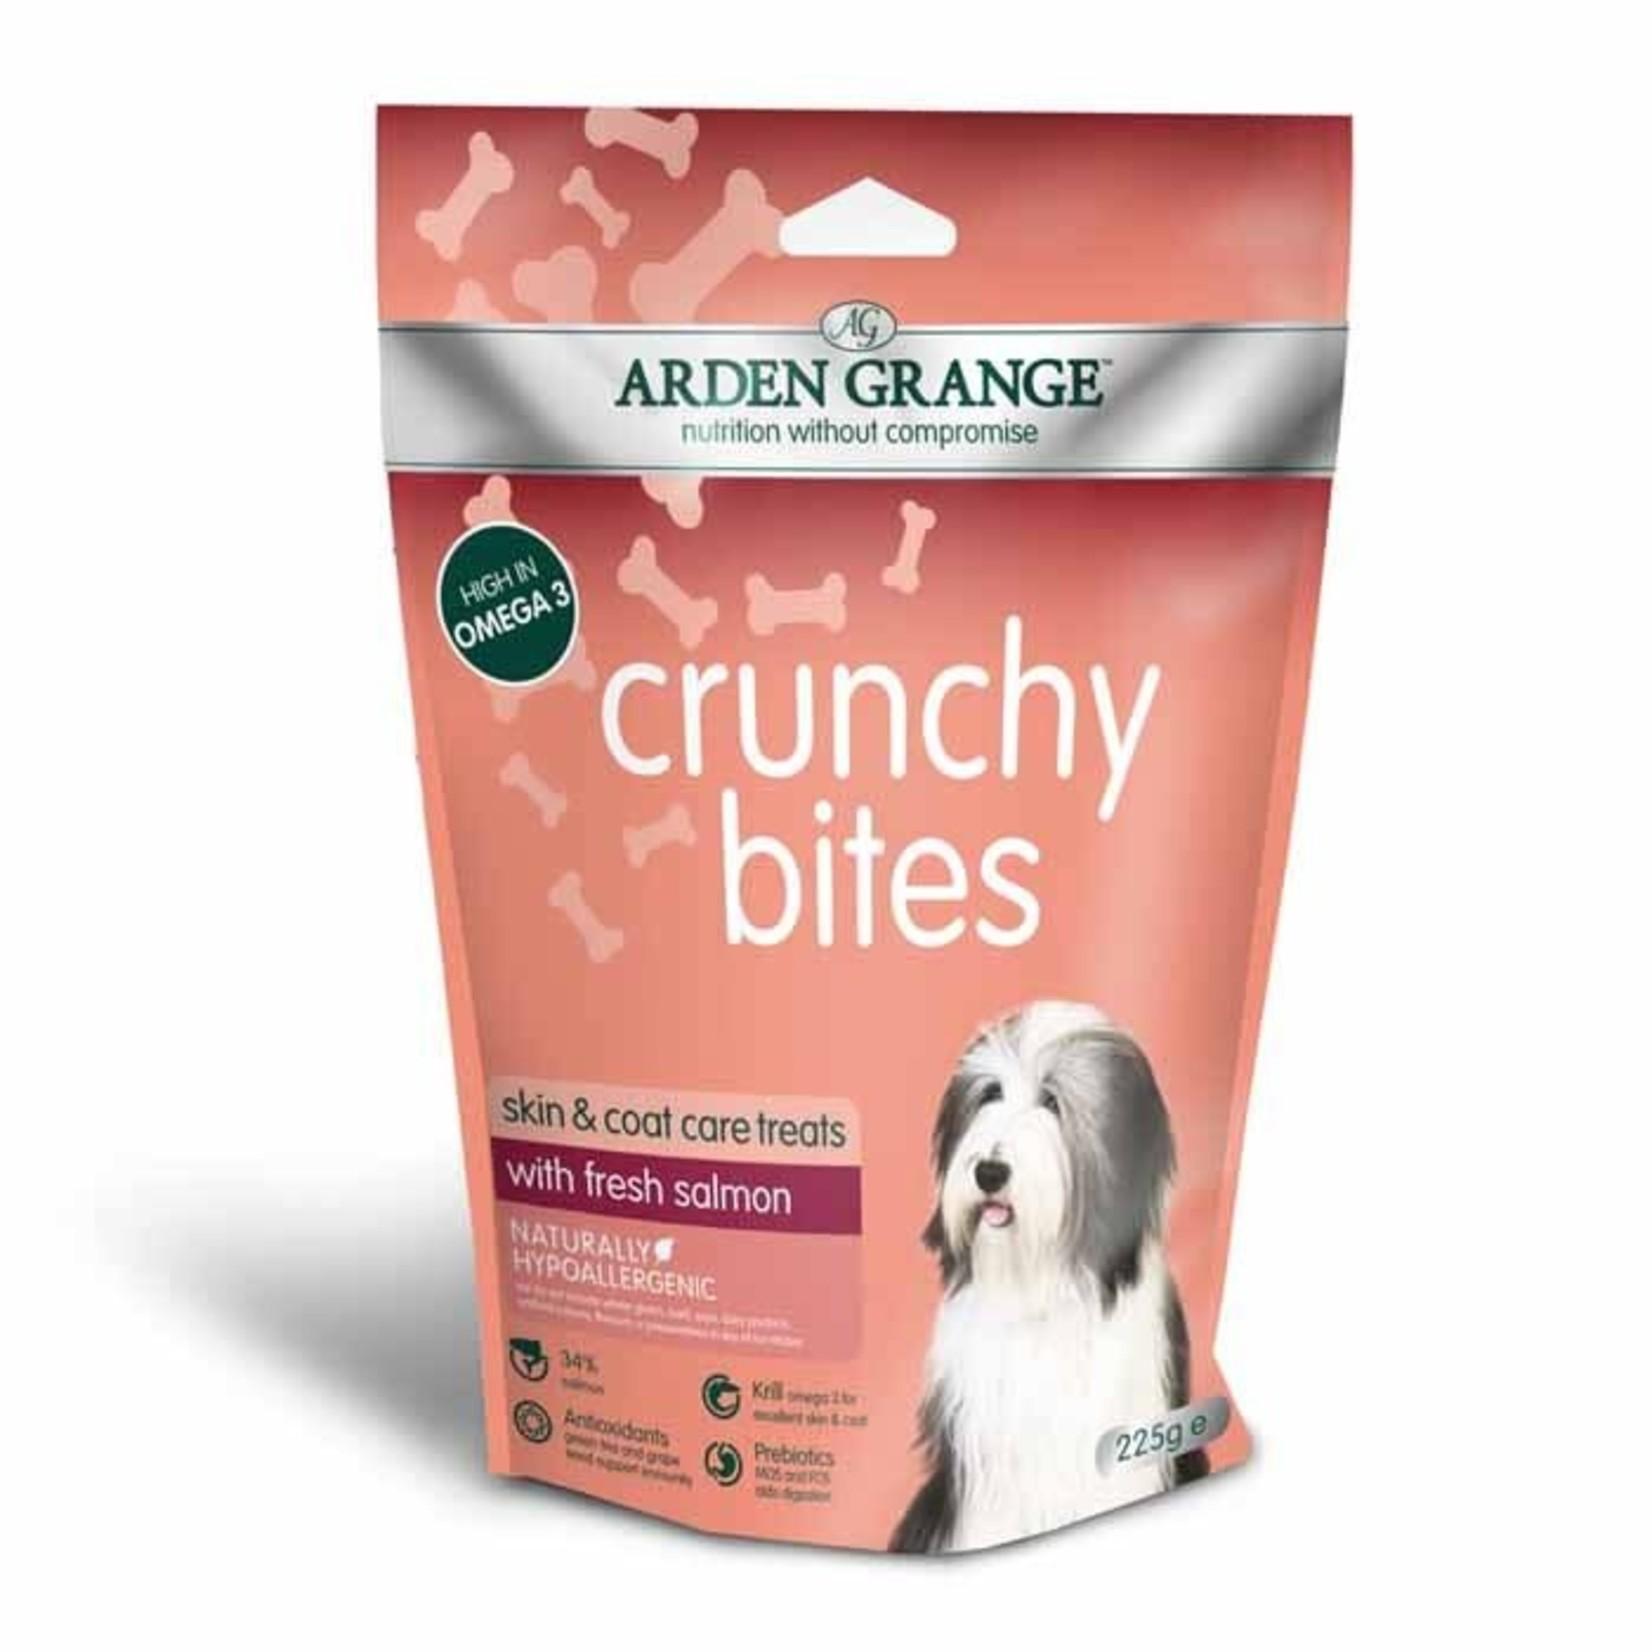 Arden Grange Crunchy Bites Skin & Coat Care Dog Treats Salmon, 225g